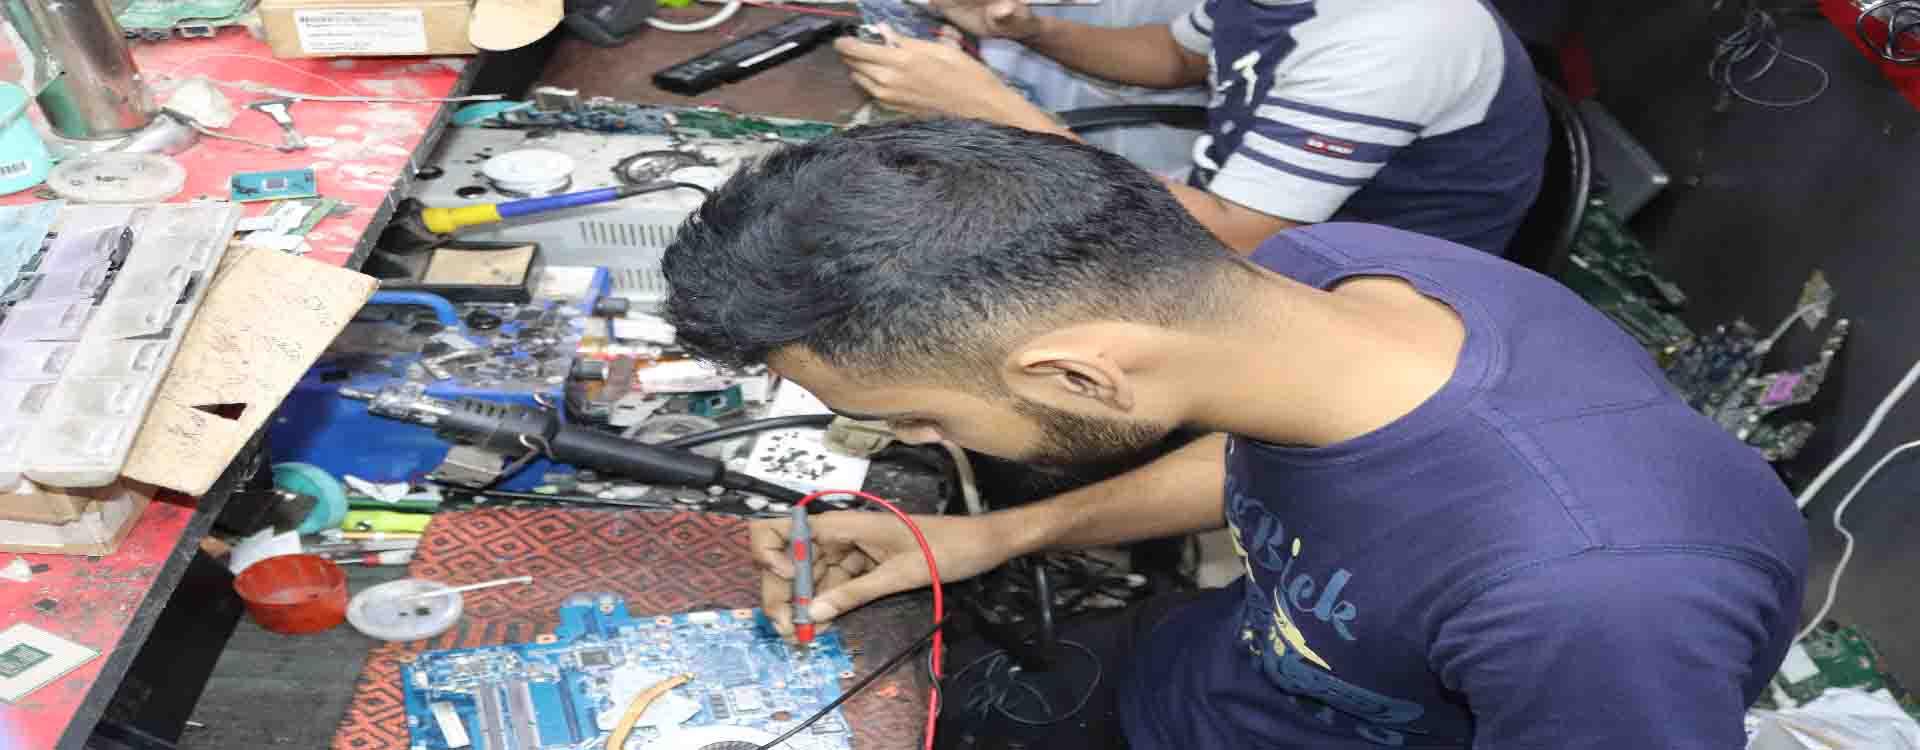 Laptop Repair in bd CTlab is the repairing reserch lab of